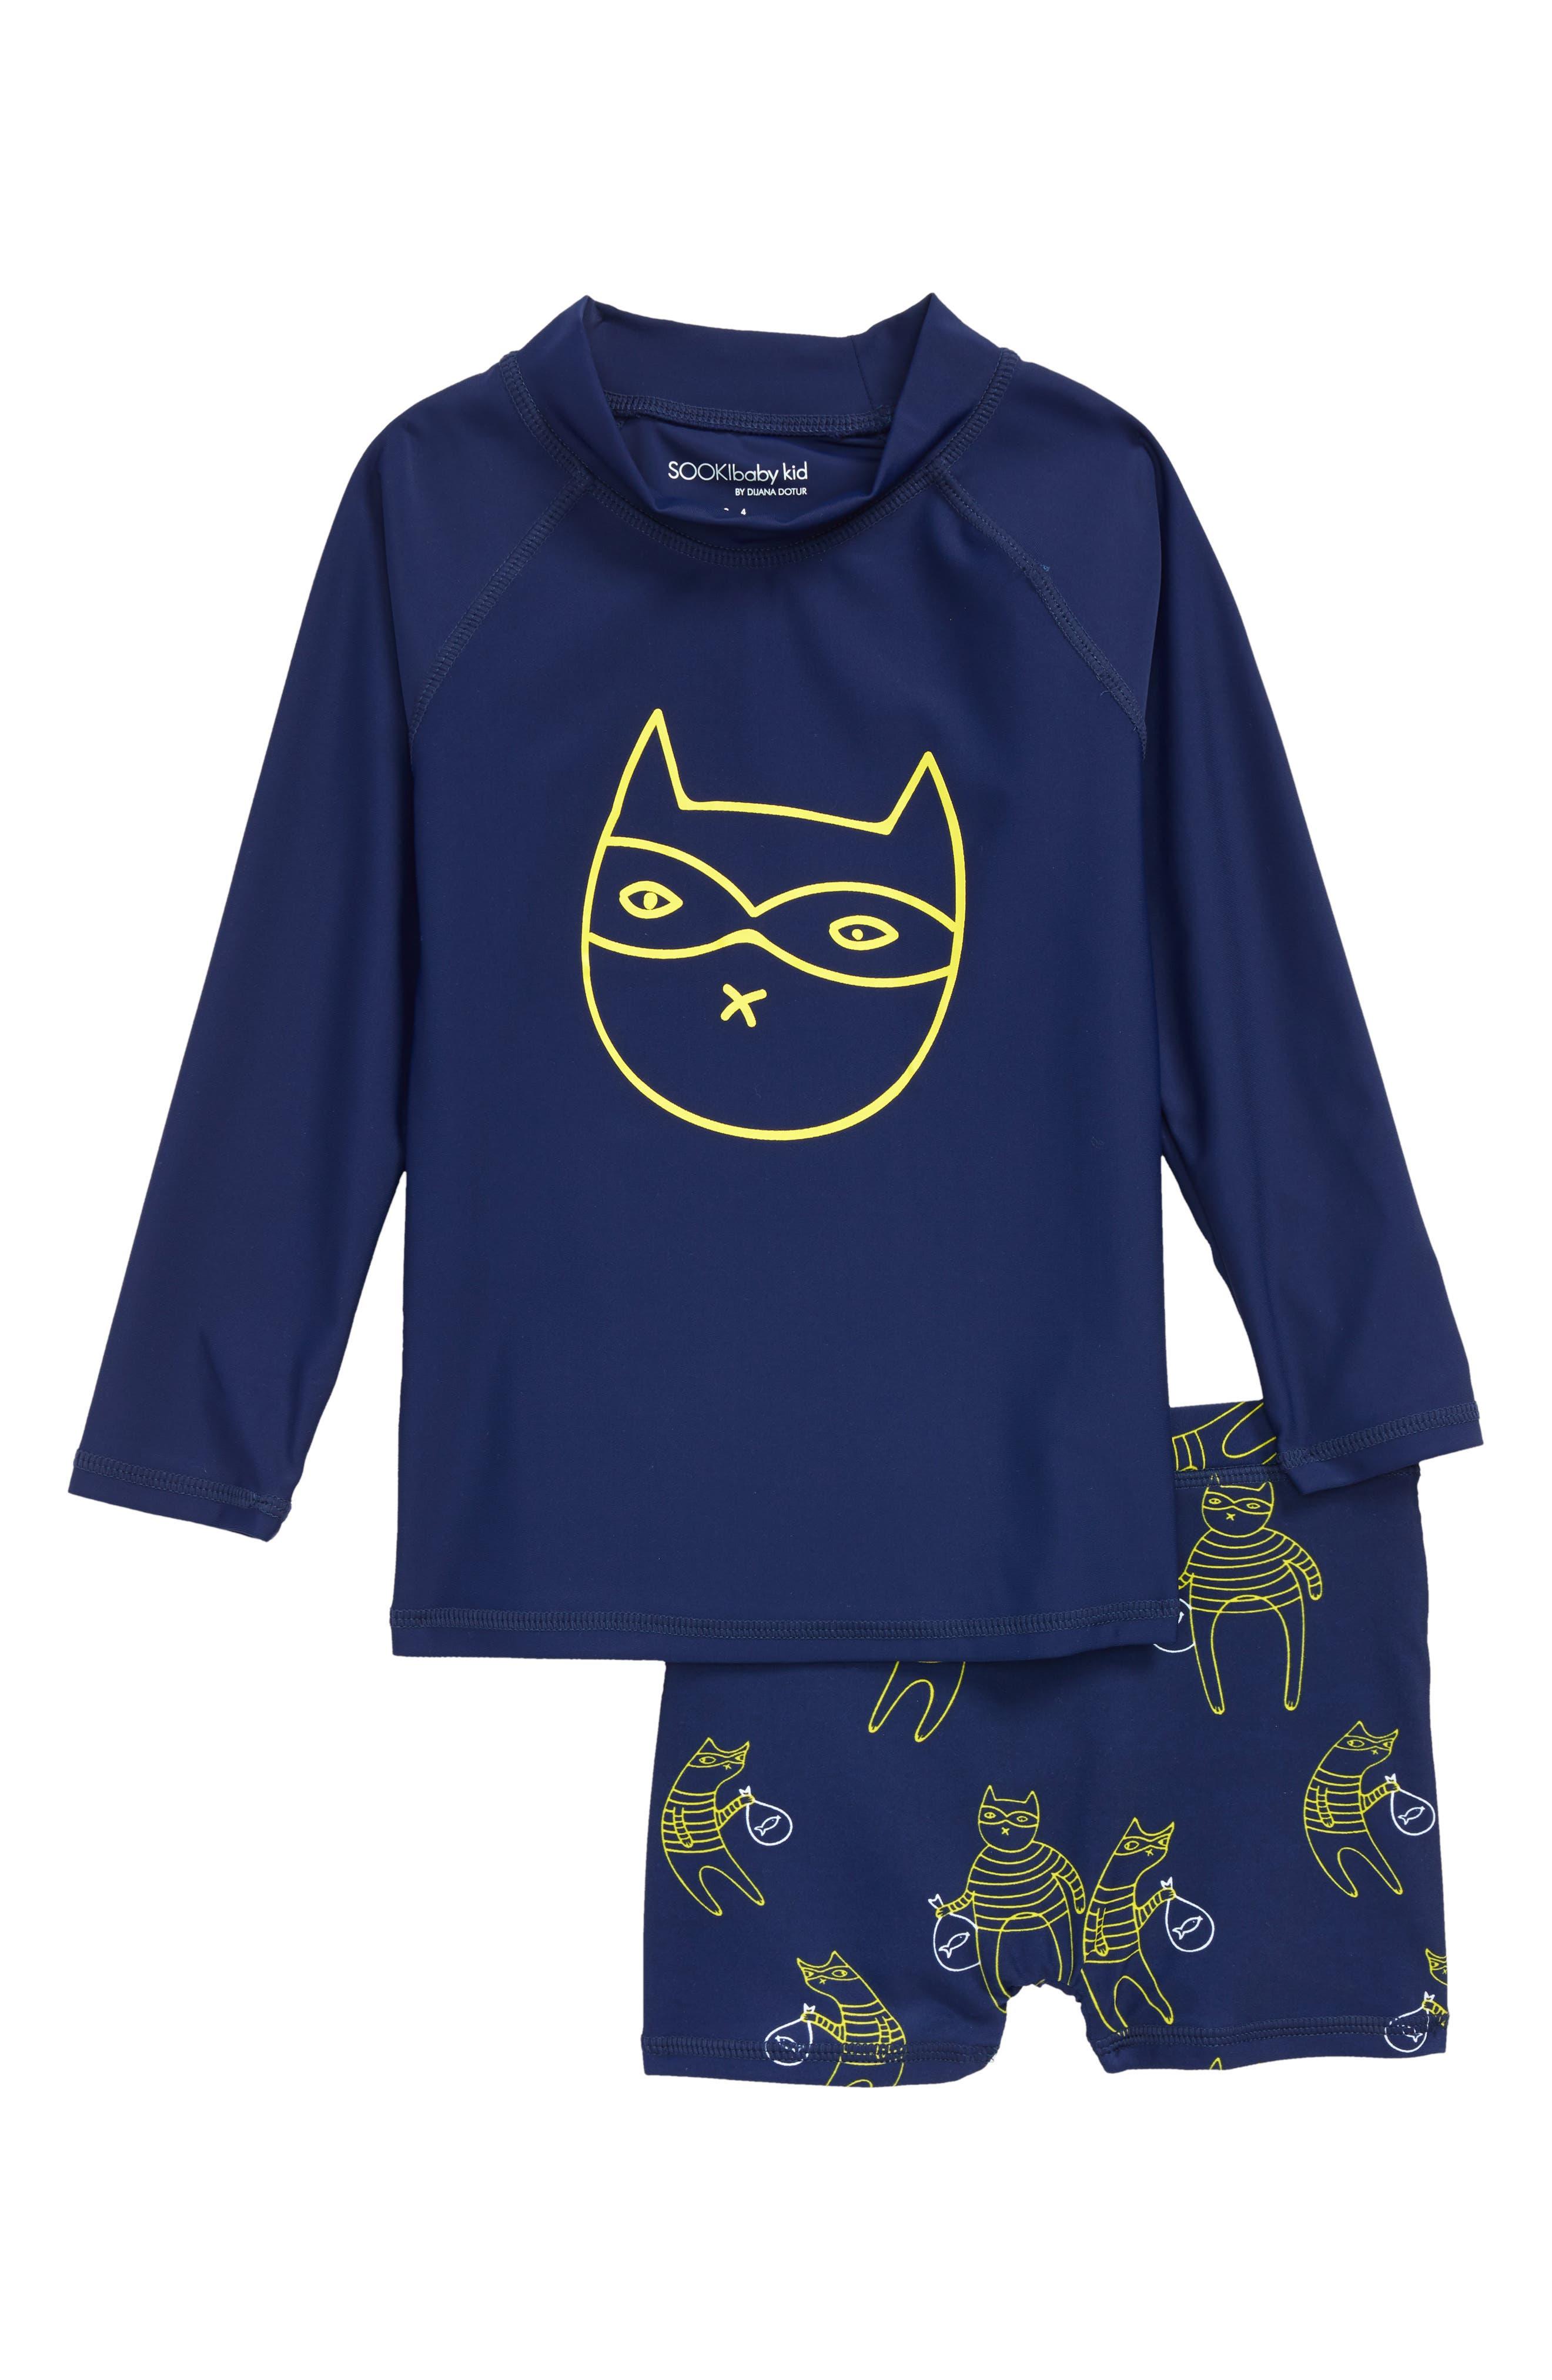 Main Image - SOOKIbaby Cat Bandit Two-Piece Rashgaurd Swimsuit (Baby Boys & Toddler Boys)